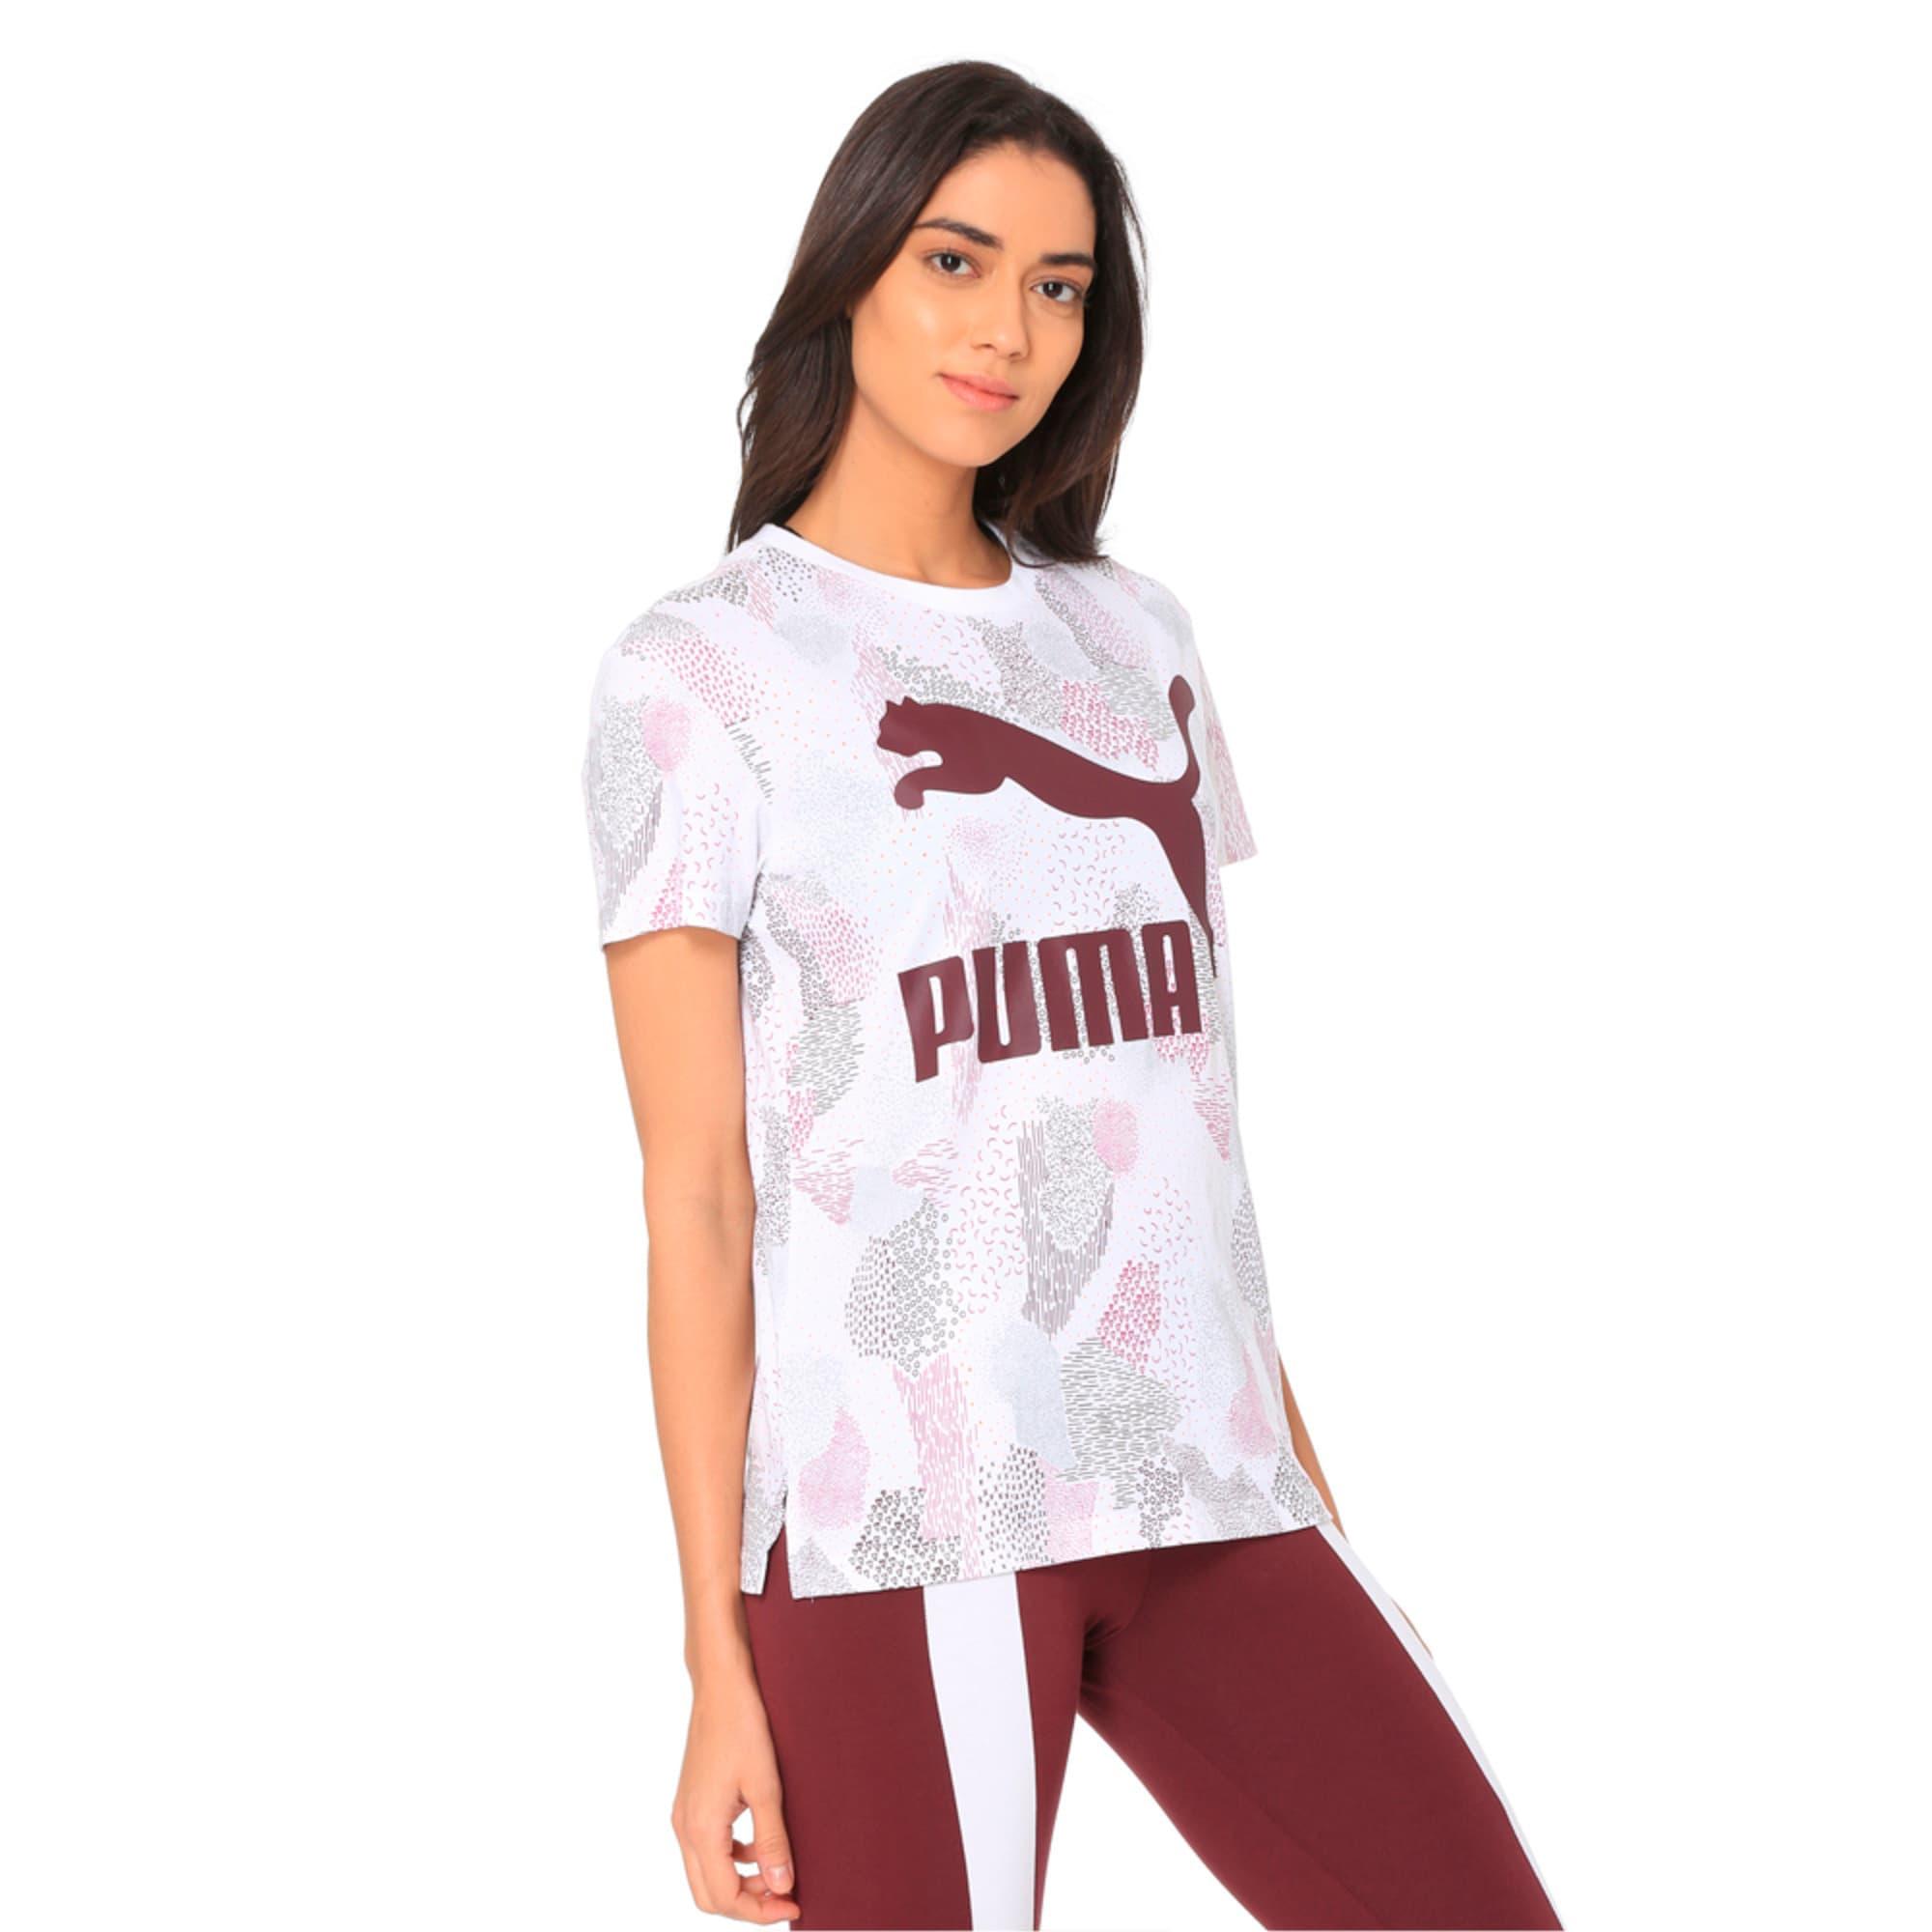 Thumbnail 2 of Classics All-Over Print Logo Women's Tee, Puma White, medium-IND